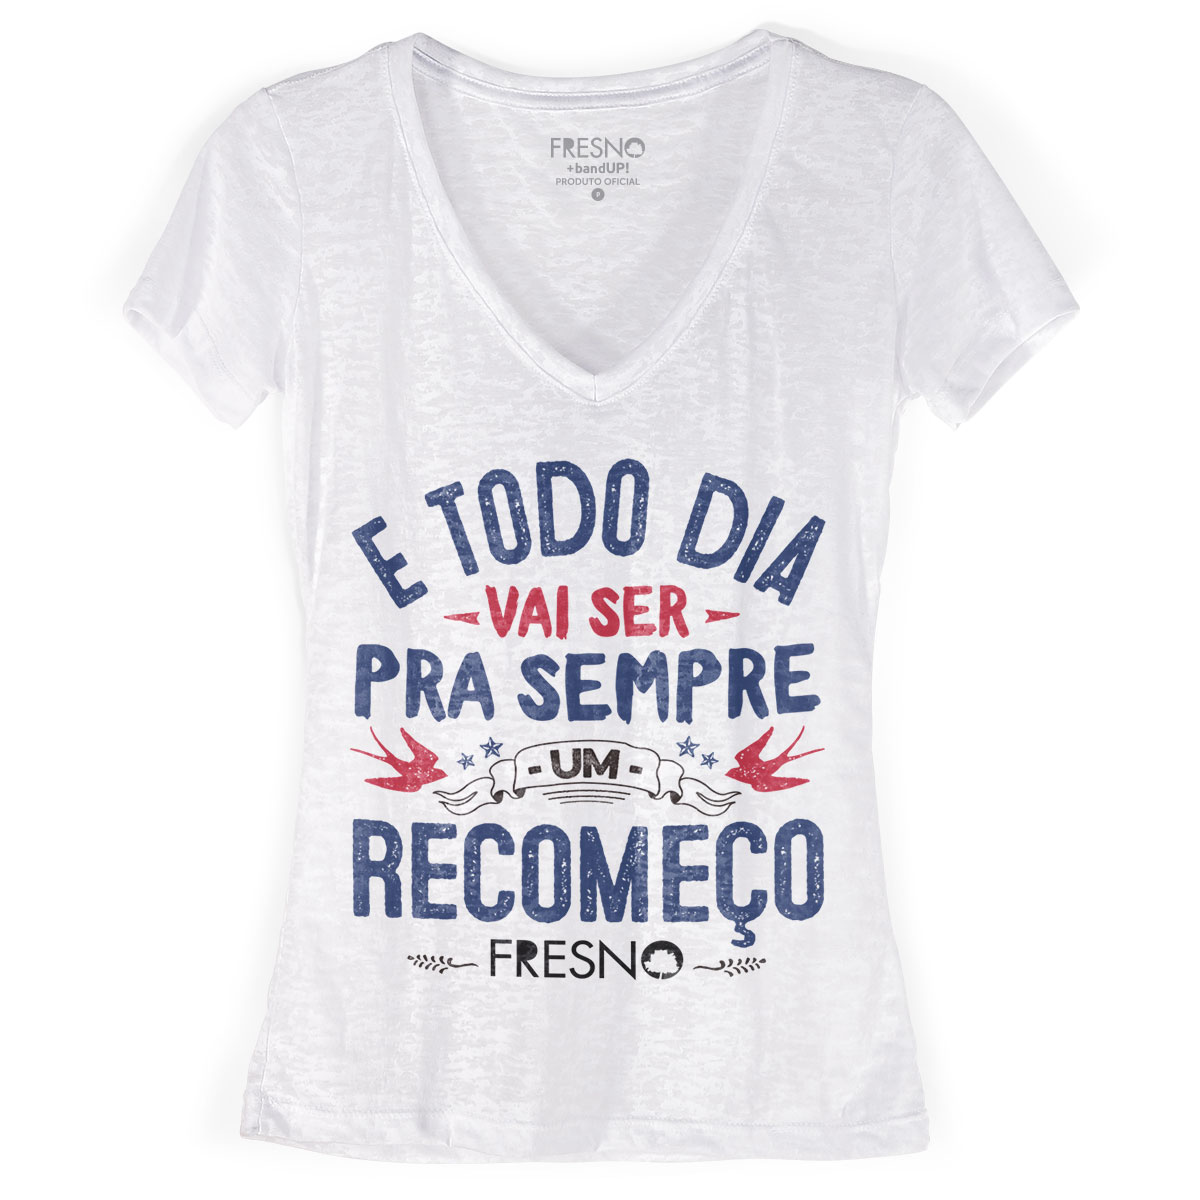 Camiseta Devor� Feminina Fresno Acordar